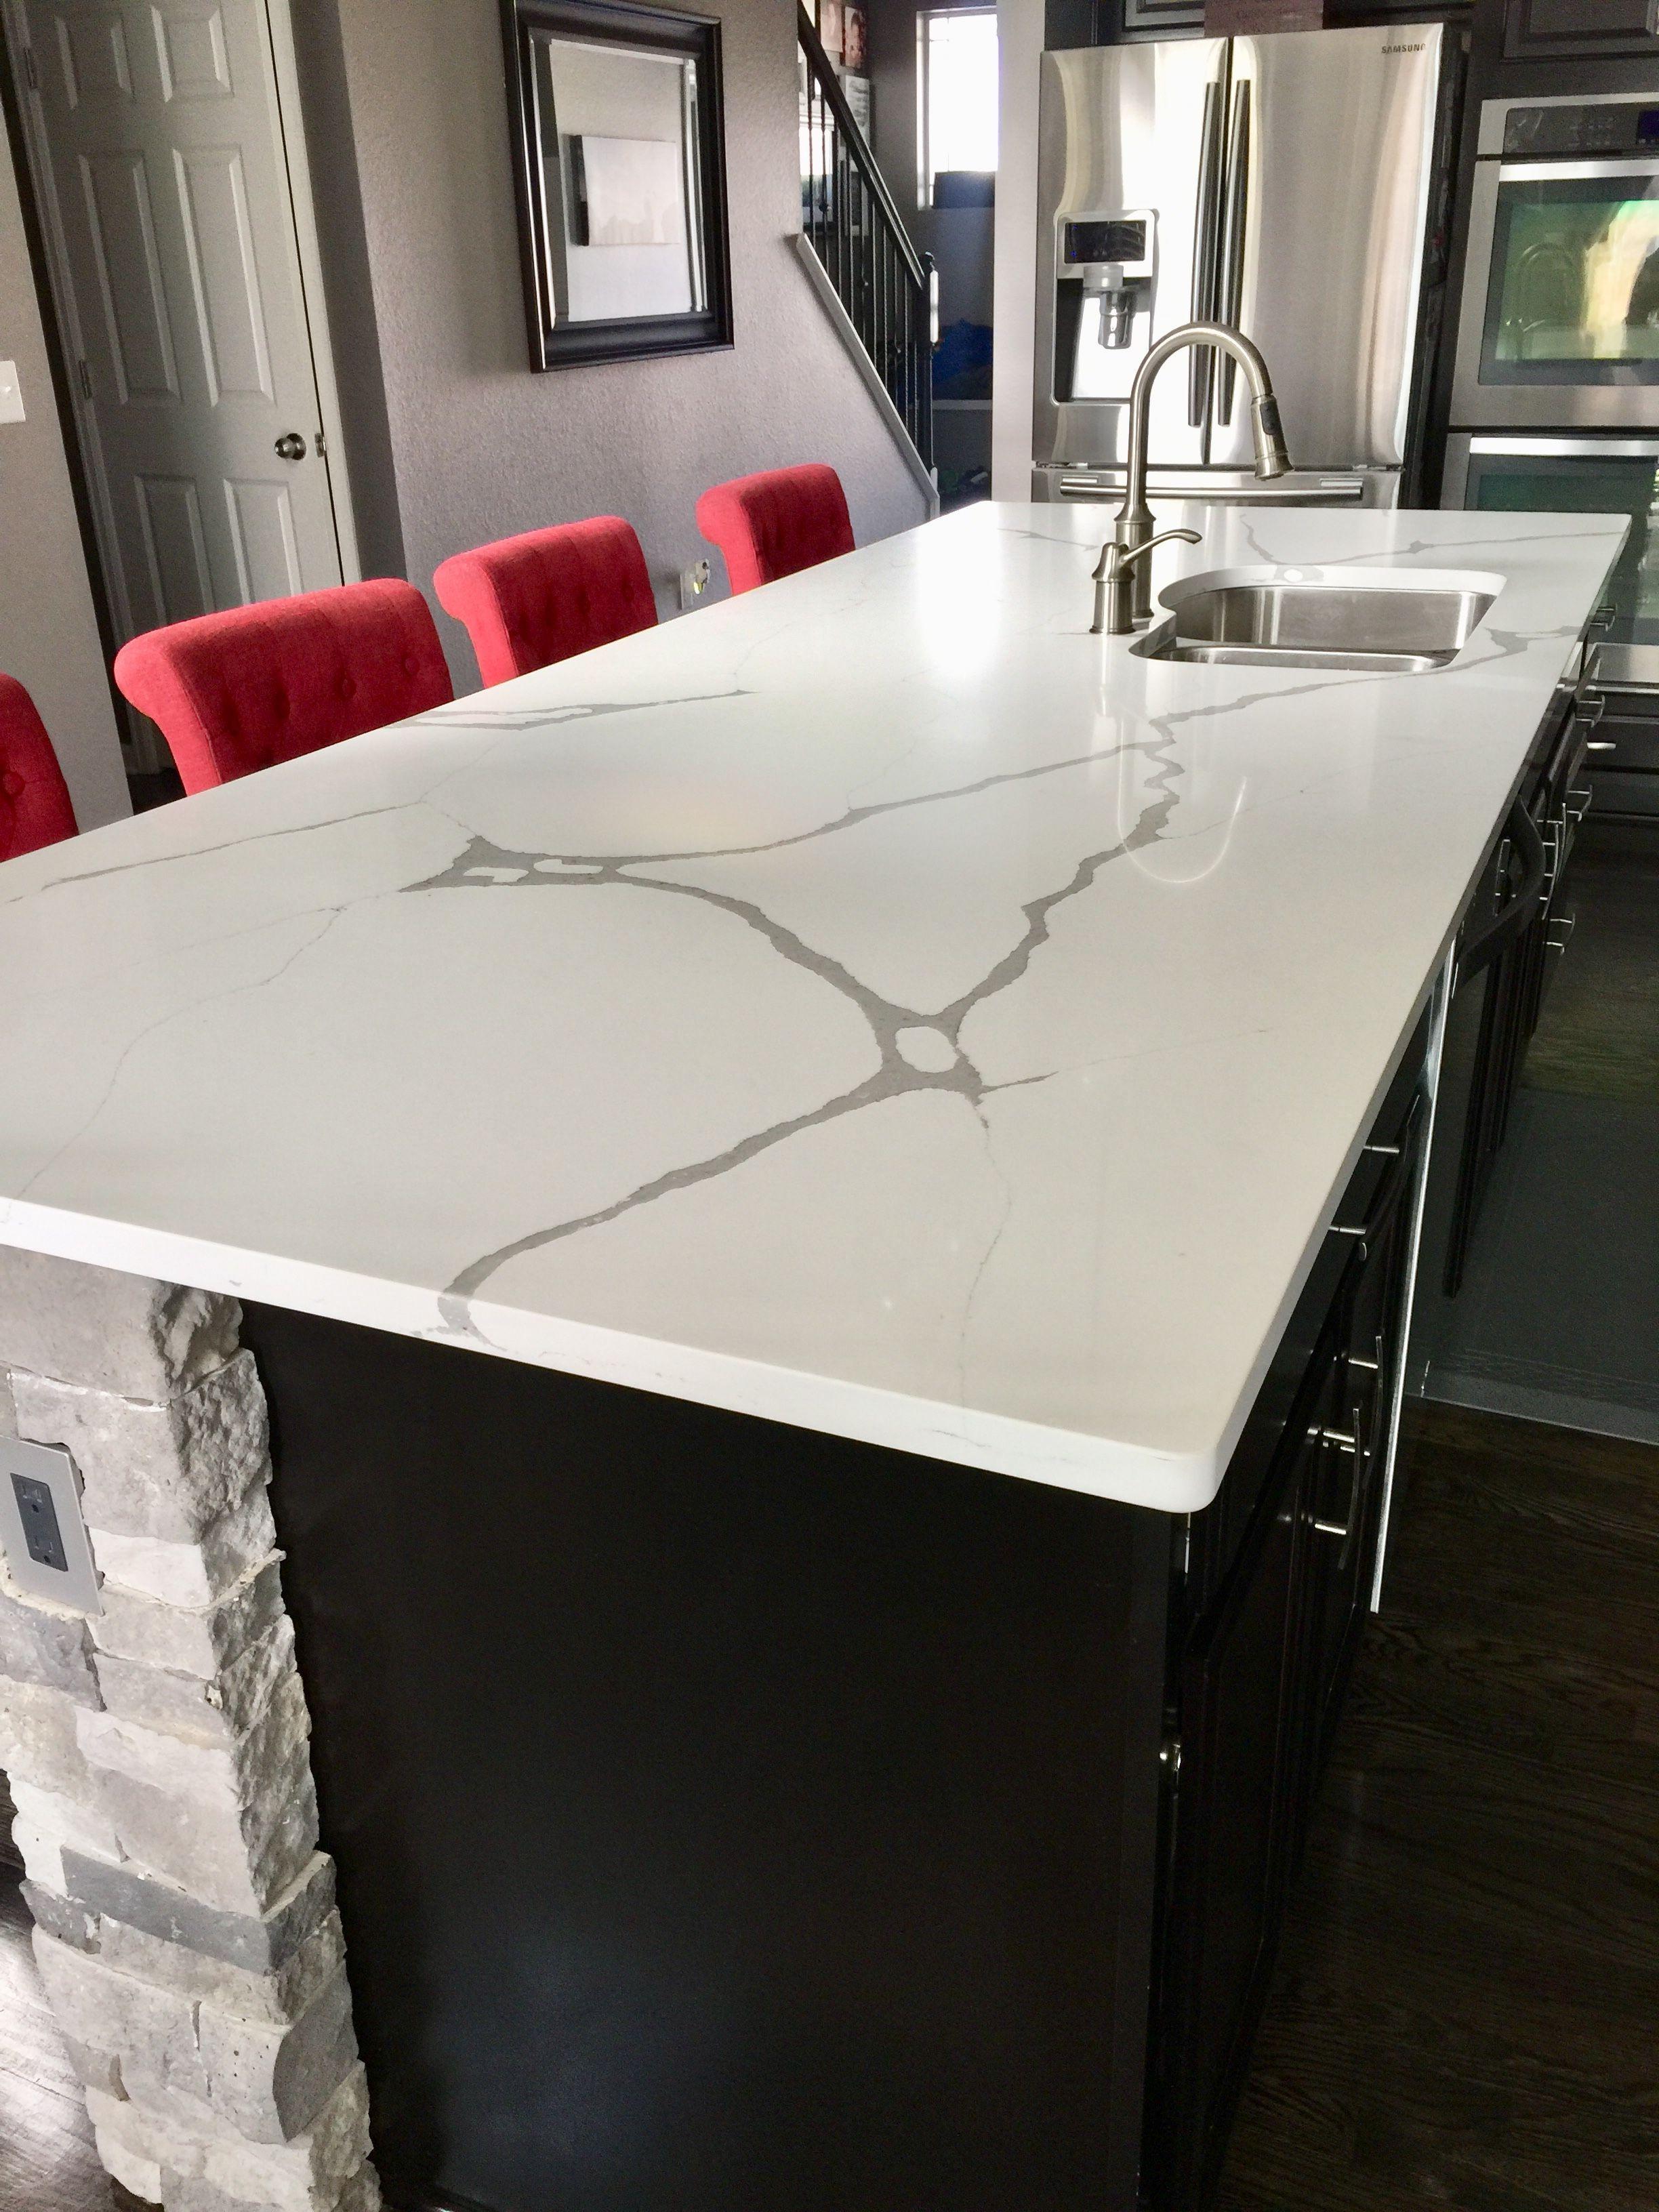 Arizona Tile Calacatta Quartz Counter Remodel In Love With This White Quartz With Gray Veins Wine Decor Kitchen Kitchen Design Decor Interior Design Kitchen